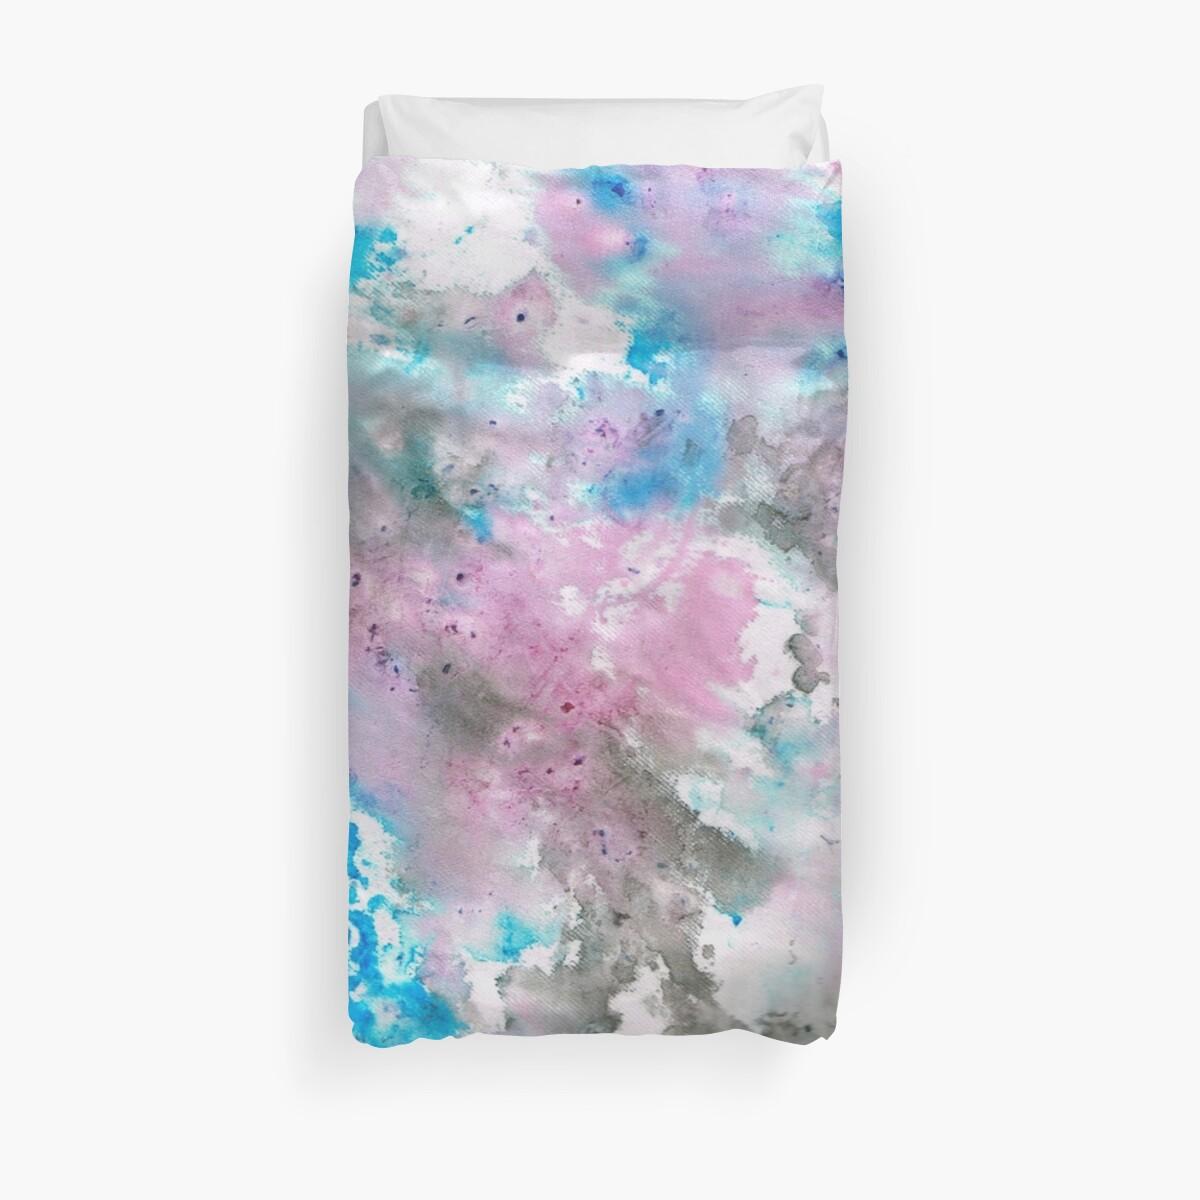 tie-dye #2 by Rose Blossom Art